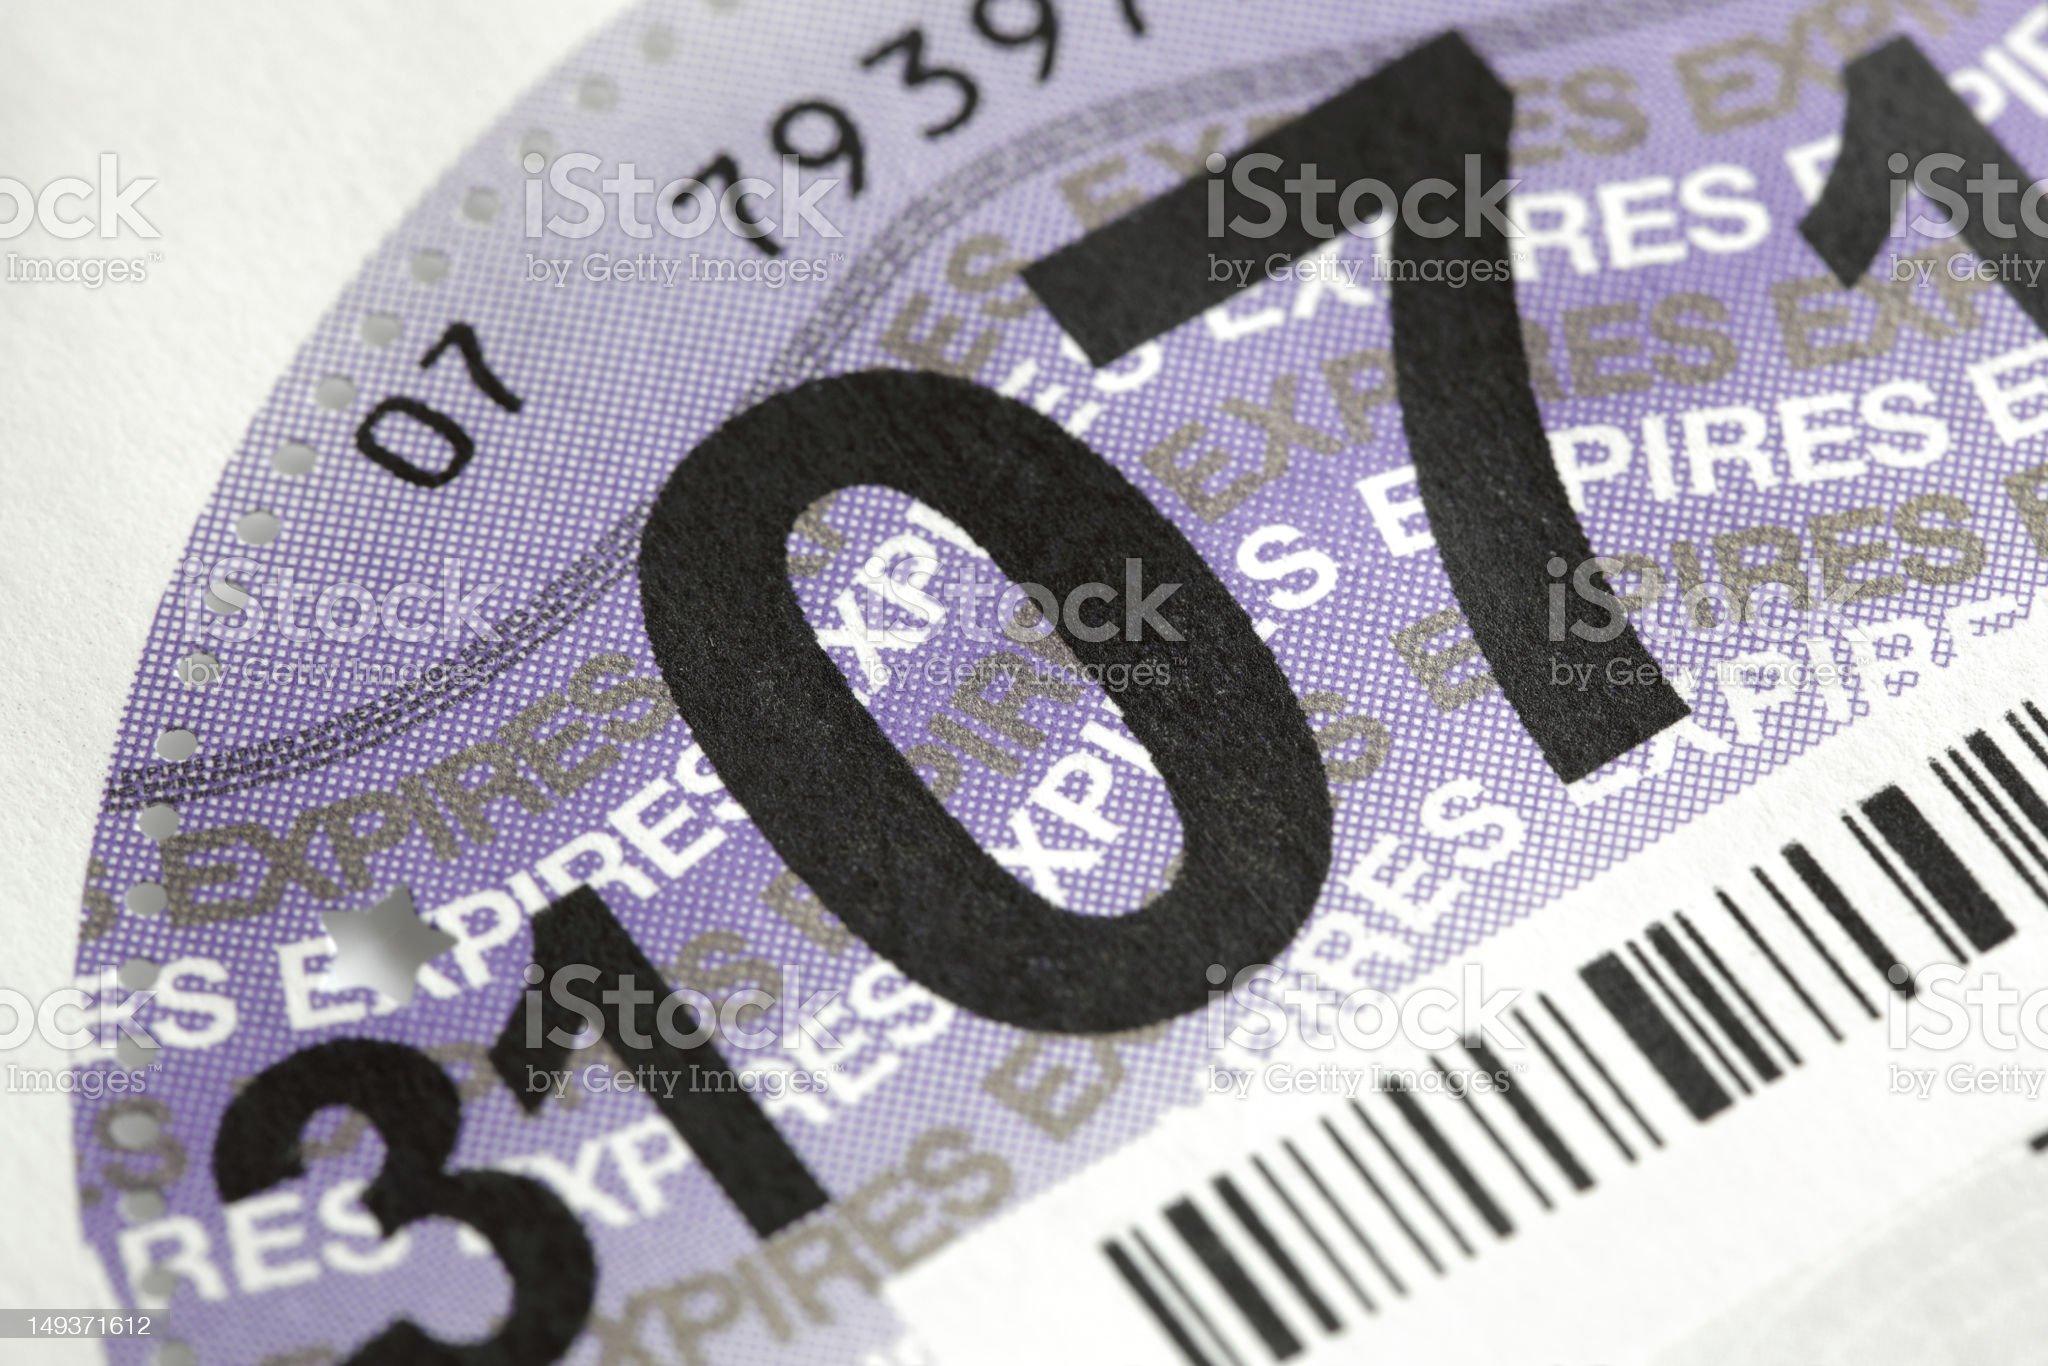 UK road tax disc royalty-free stock photo